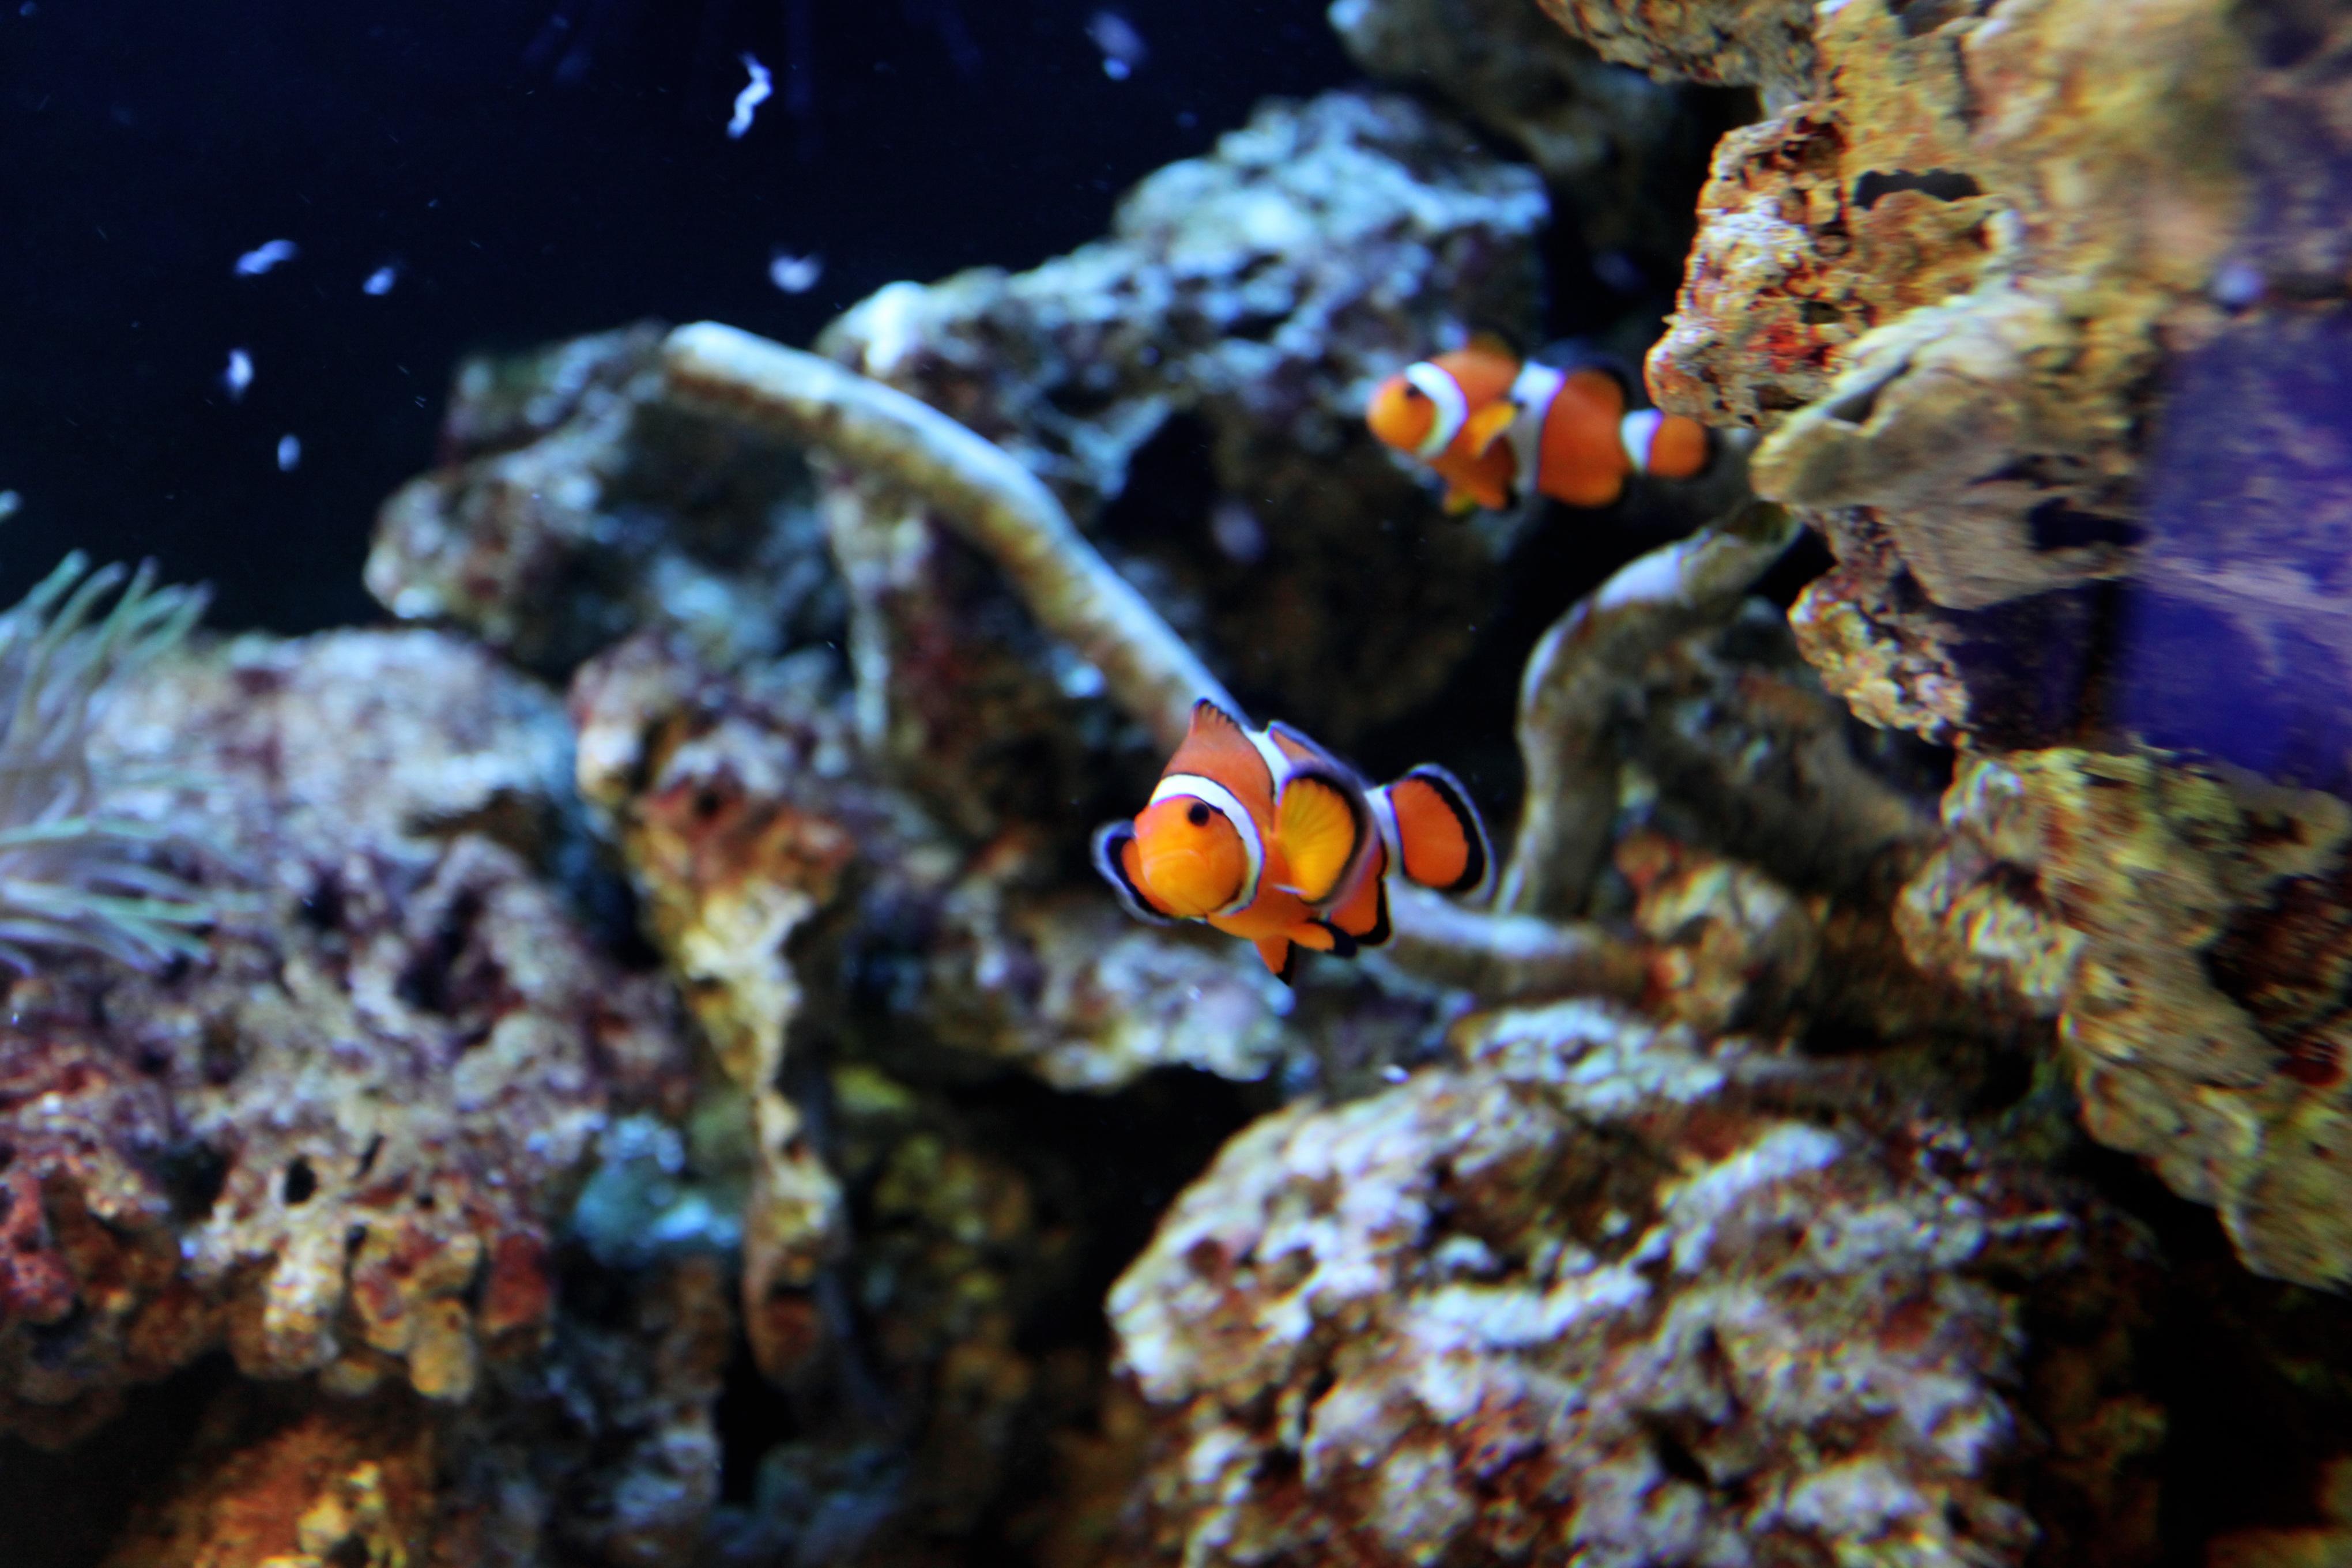 Free Images : water, nature, wildlife, underwater, fauna ... - photo#23